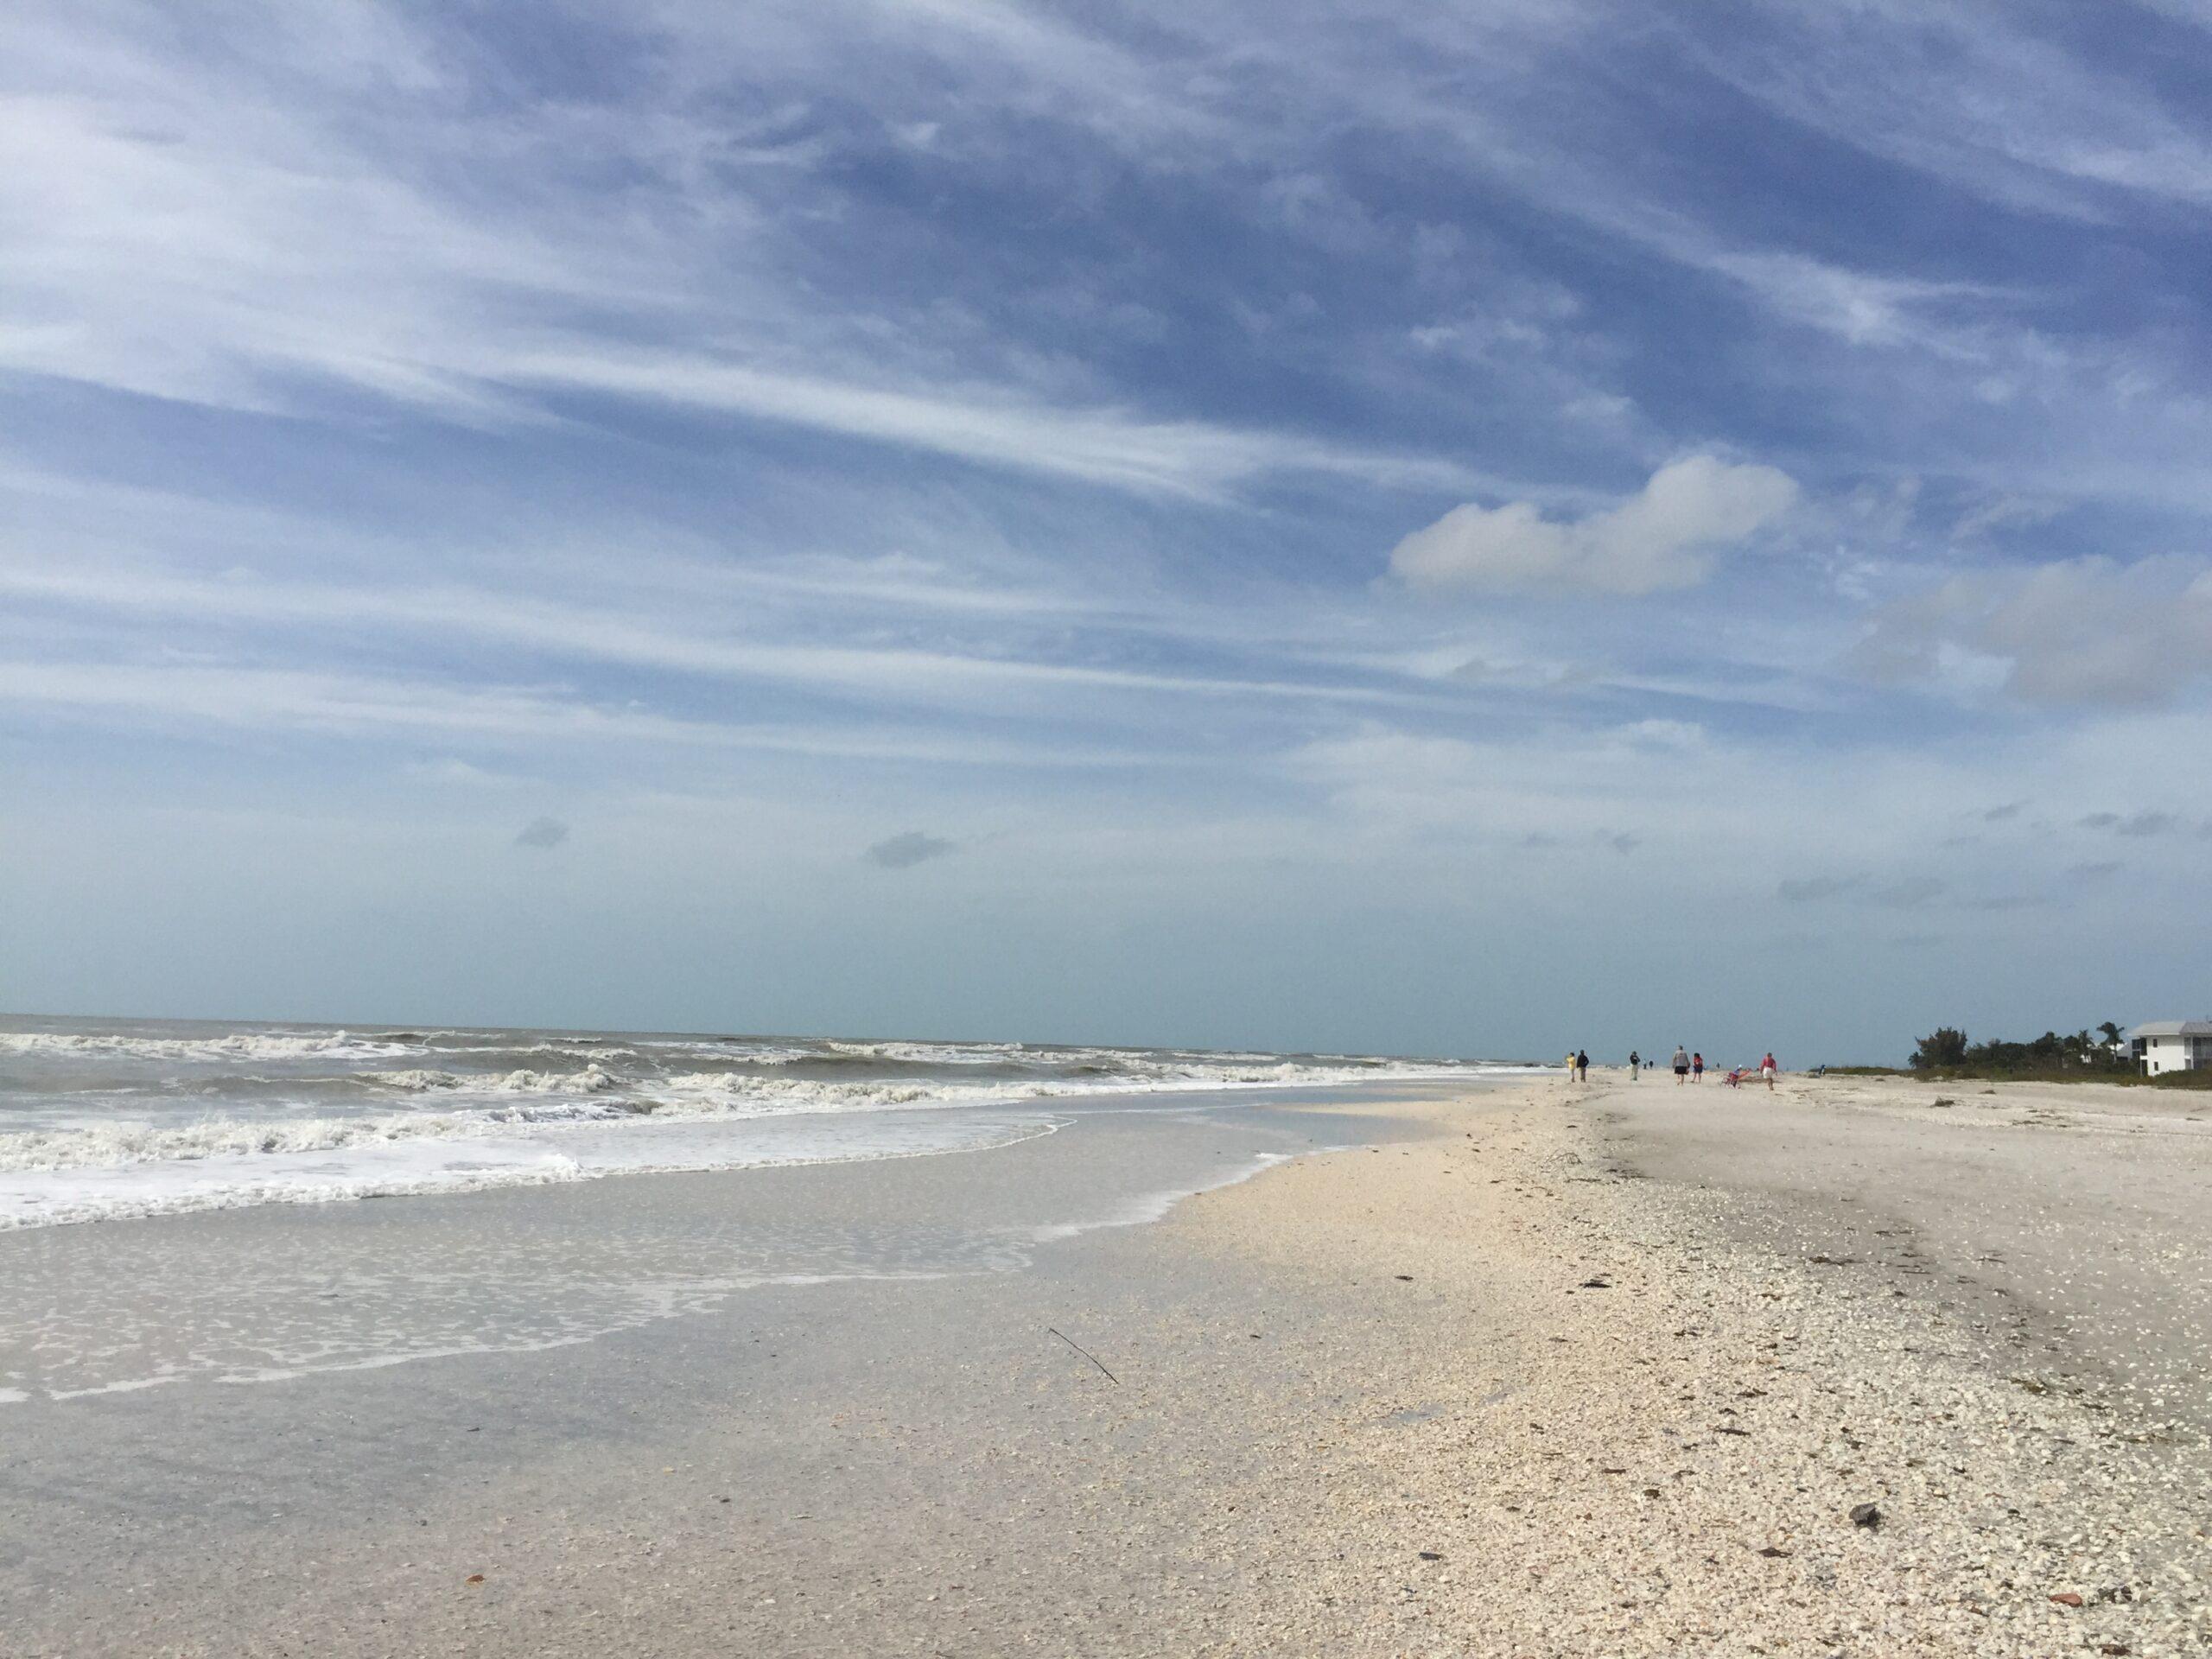 Tarpon Bay Beach on Sanibel Island, Florida